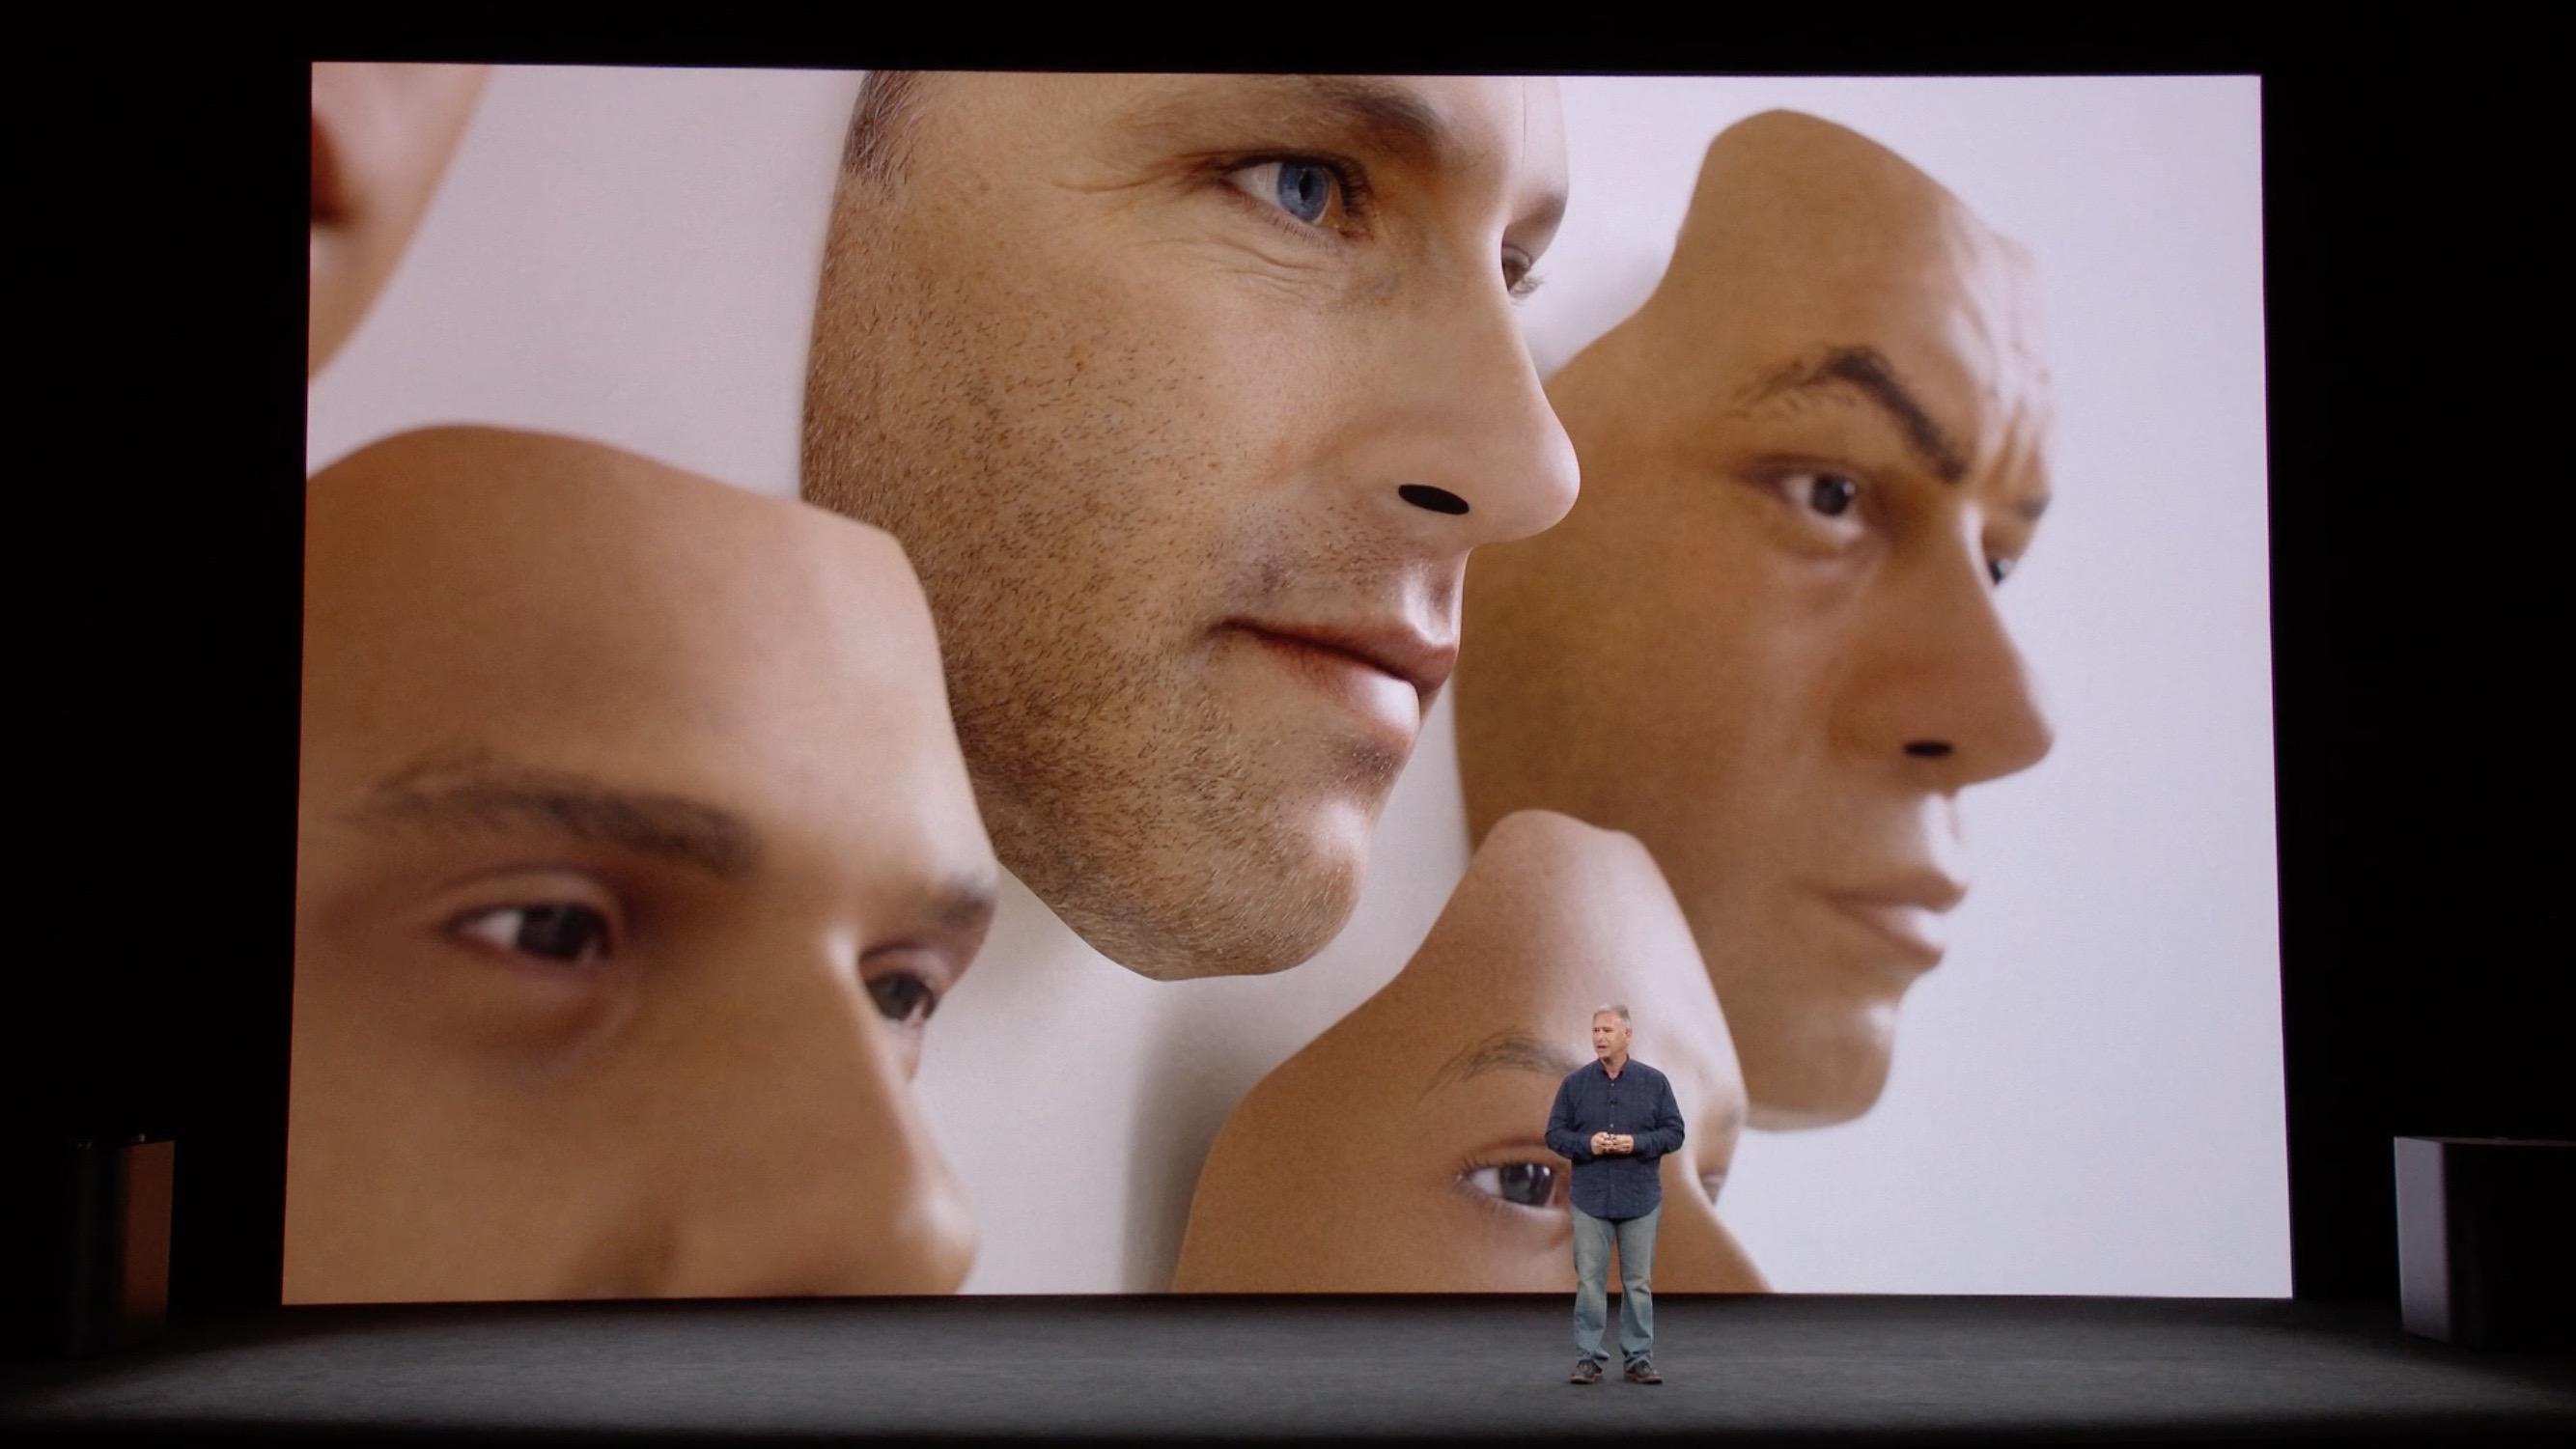 Face ID distingue máscaras de pessoas reais